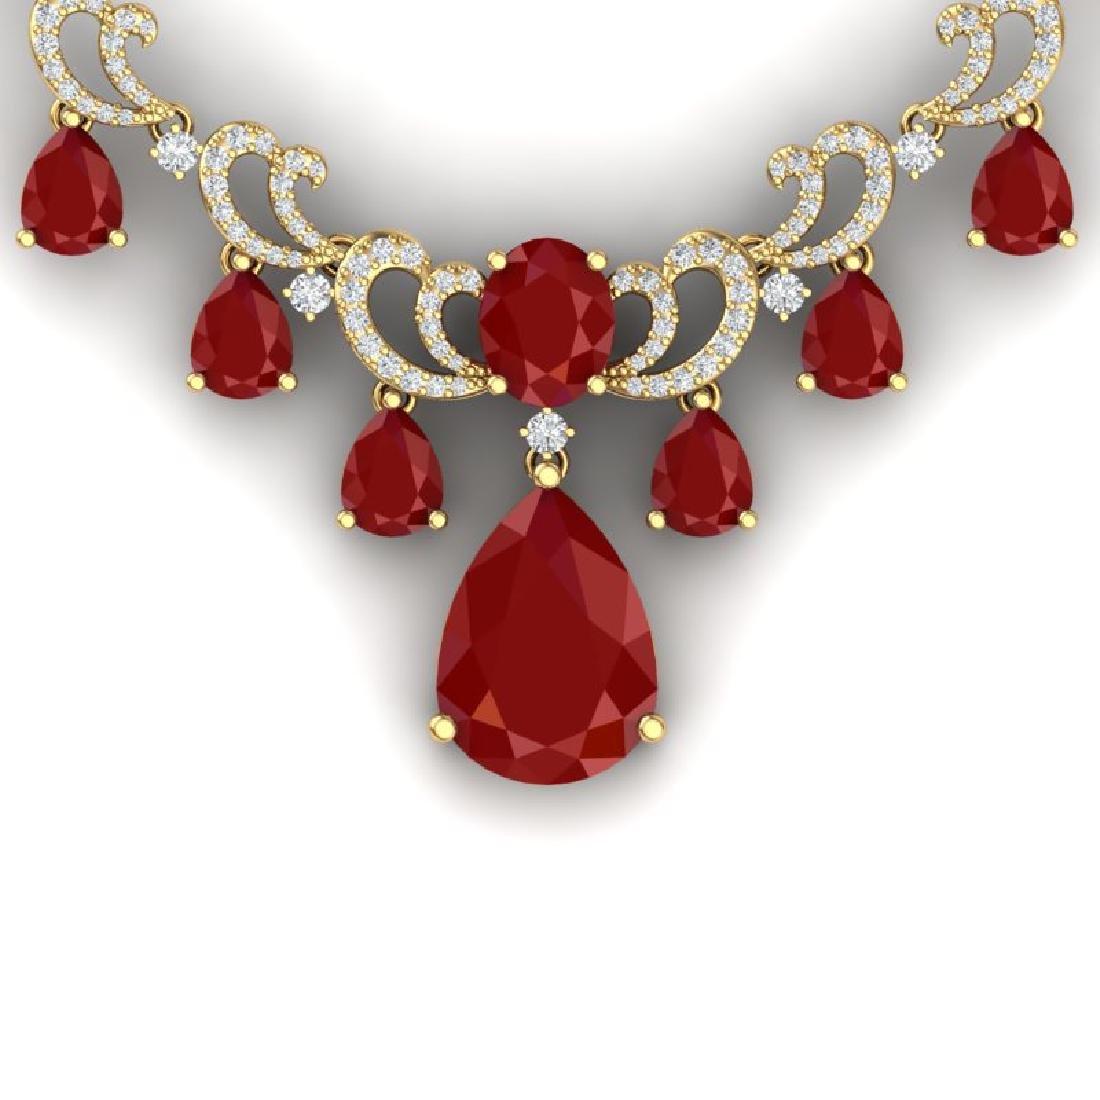 36.85 CTW Royalty Ruby & VS Diamond Necklace 18K Yellow